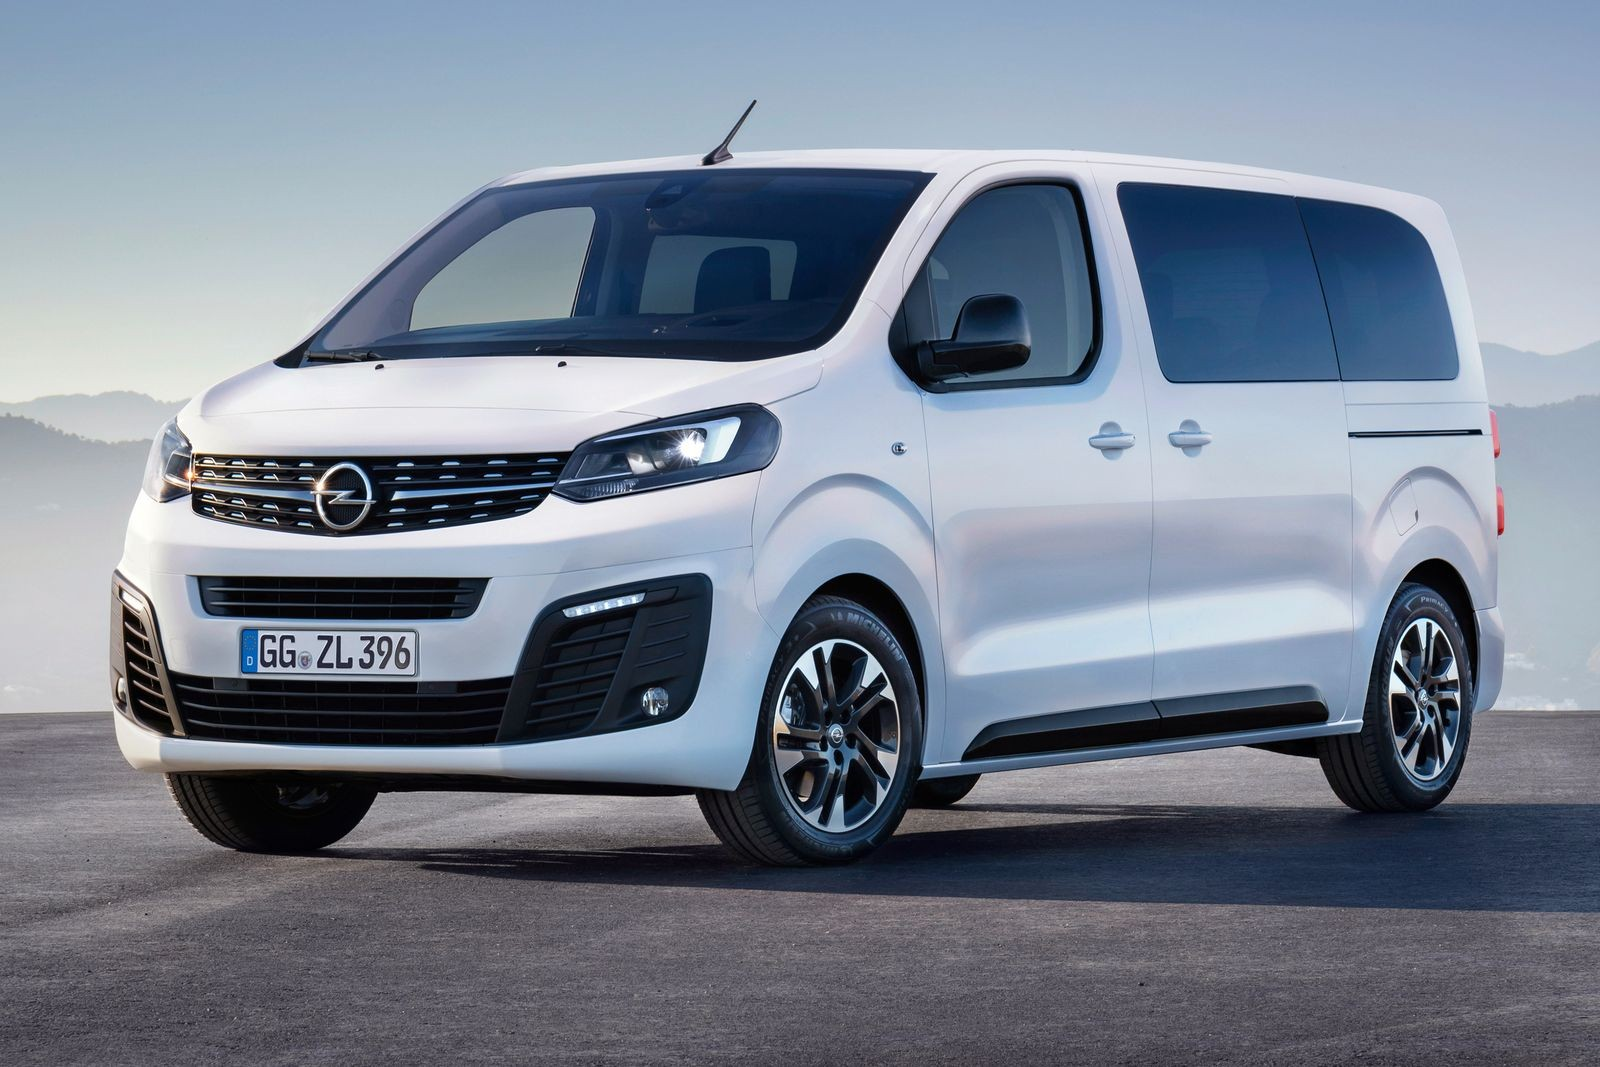 Opel Zafira Life – это слегка перелицованный Citroen SpaceTourer / Peugeot Traveller.